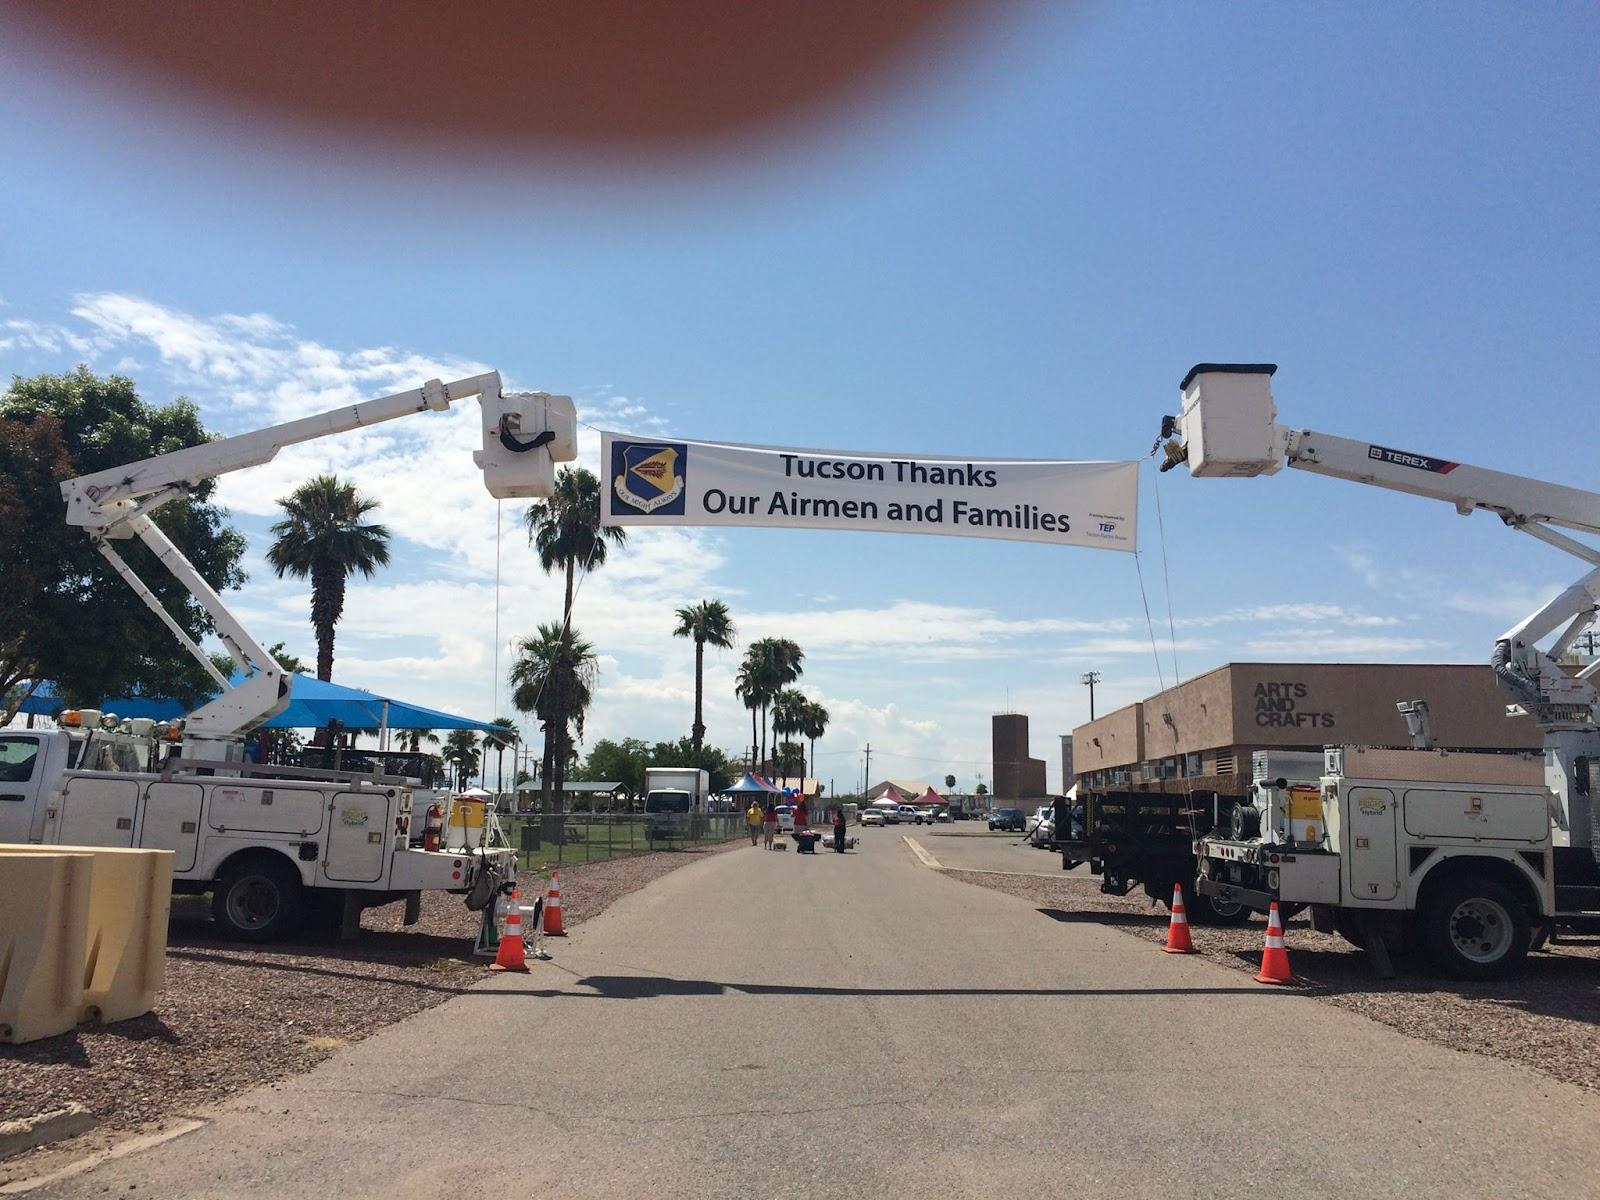 Tucson Thanks our Airmen and Families - 11894302_890712074336240_5261212769157460720_o.jpg